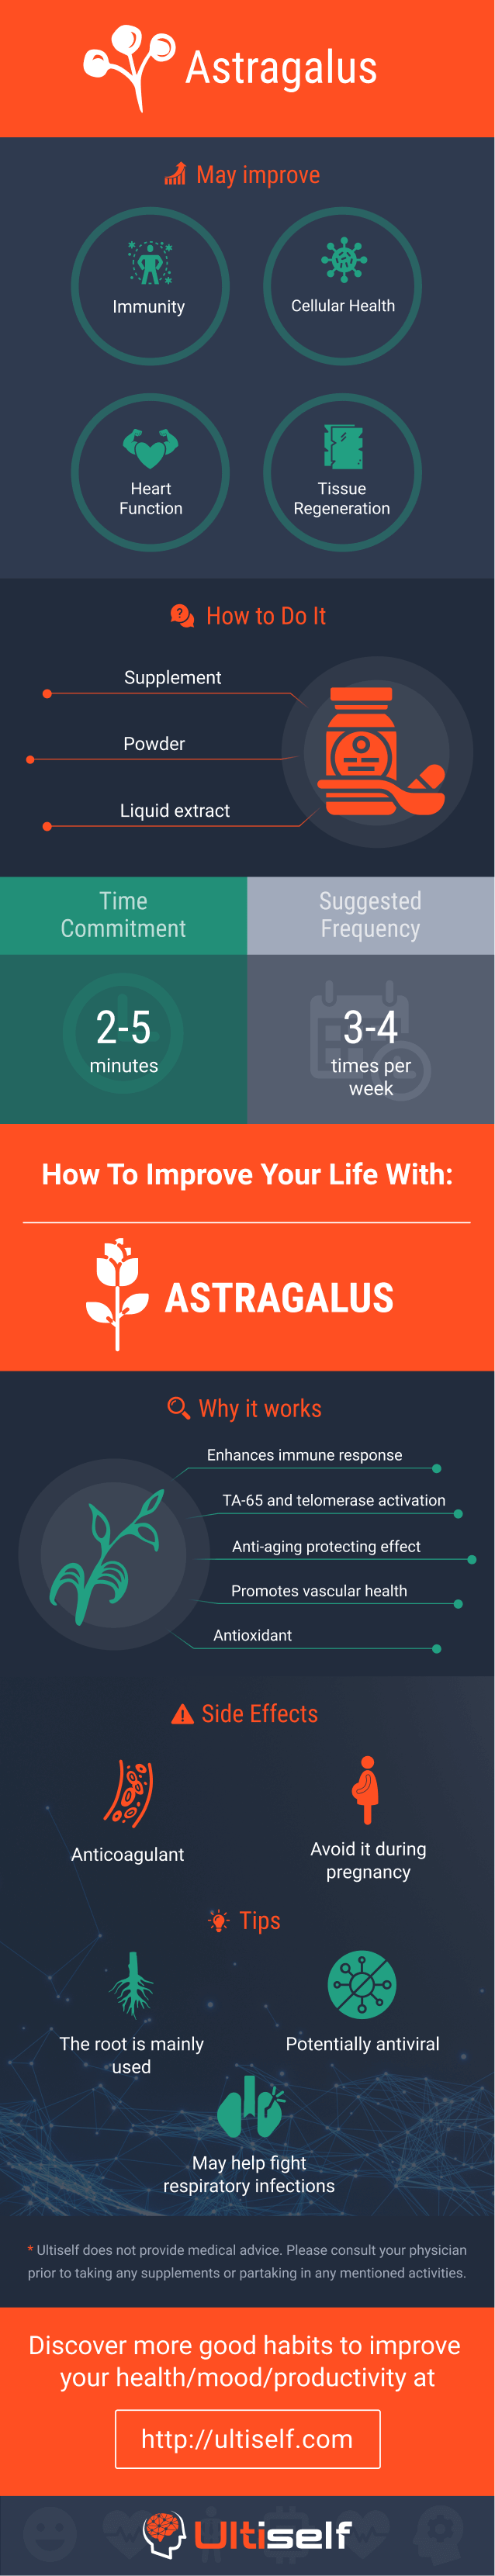 Astragalus infographic